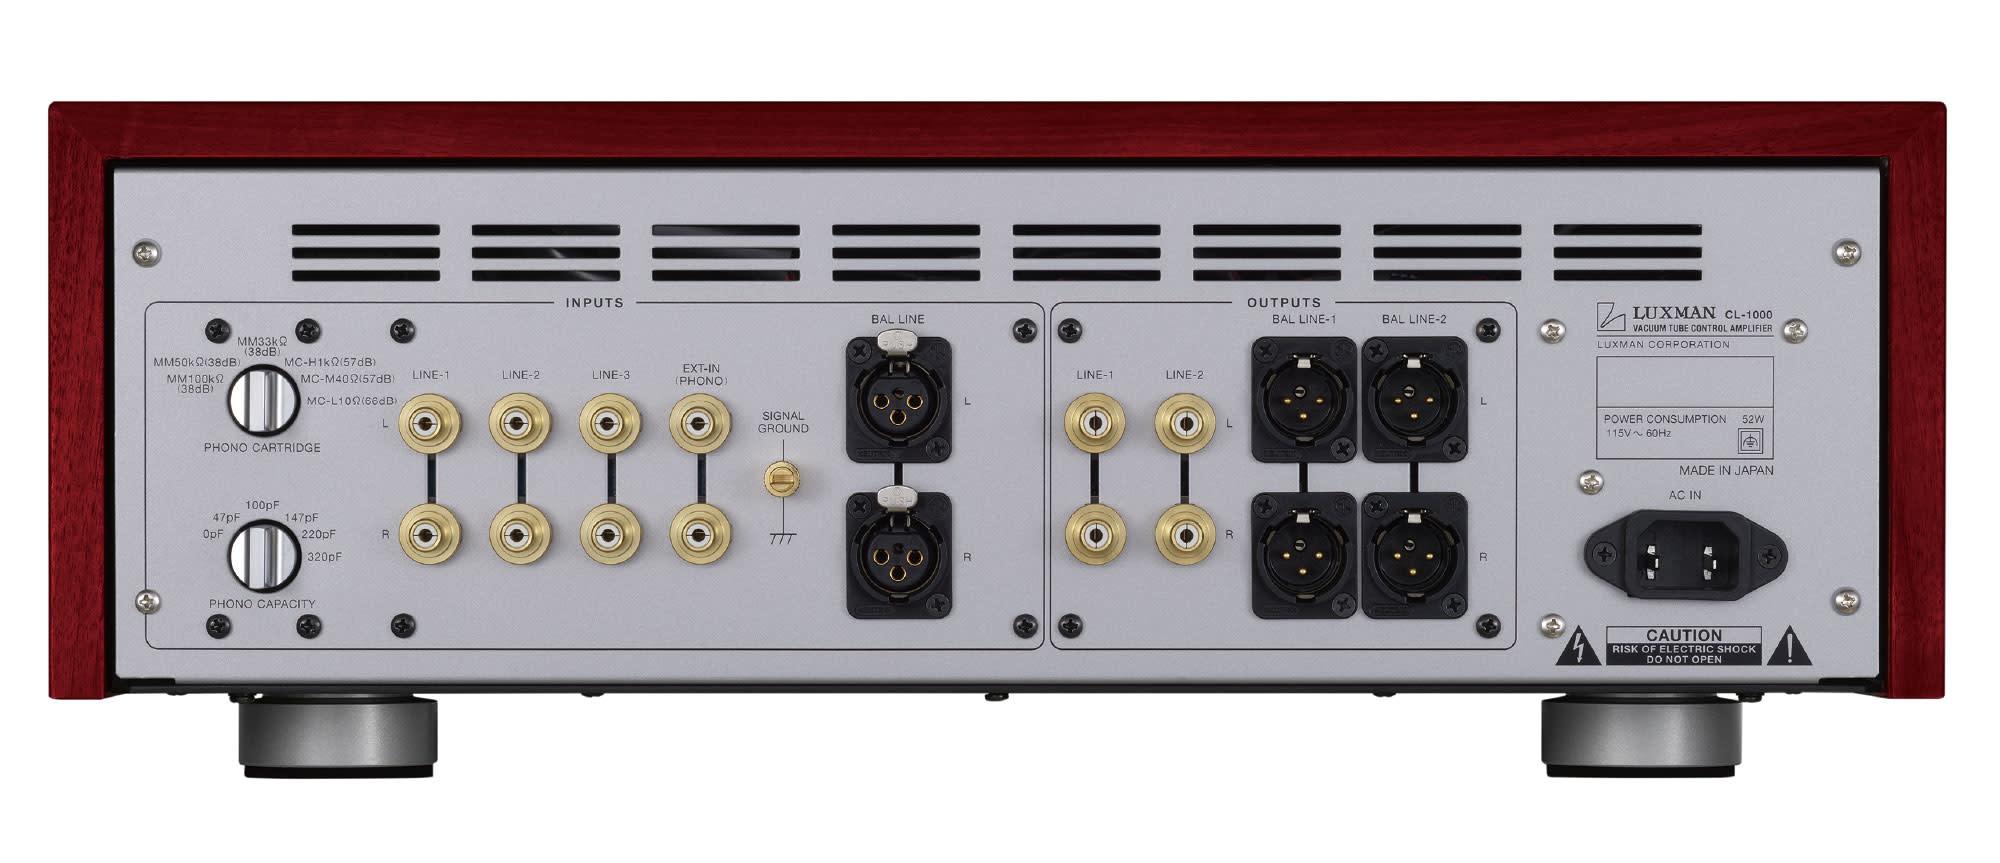 Luxman Vacuum Tube Control Amplifier CL-1000